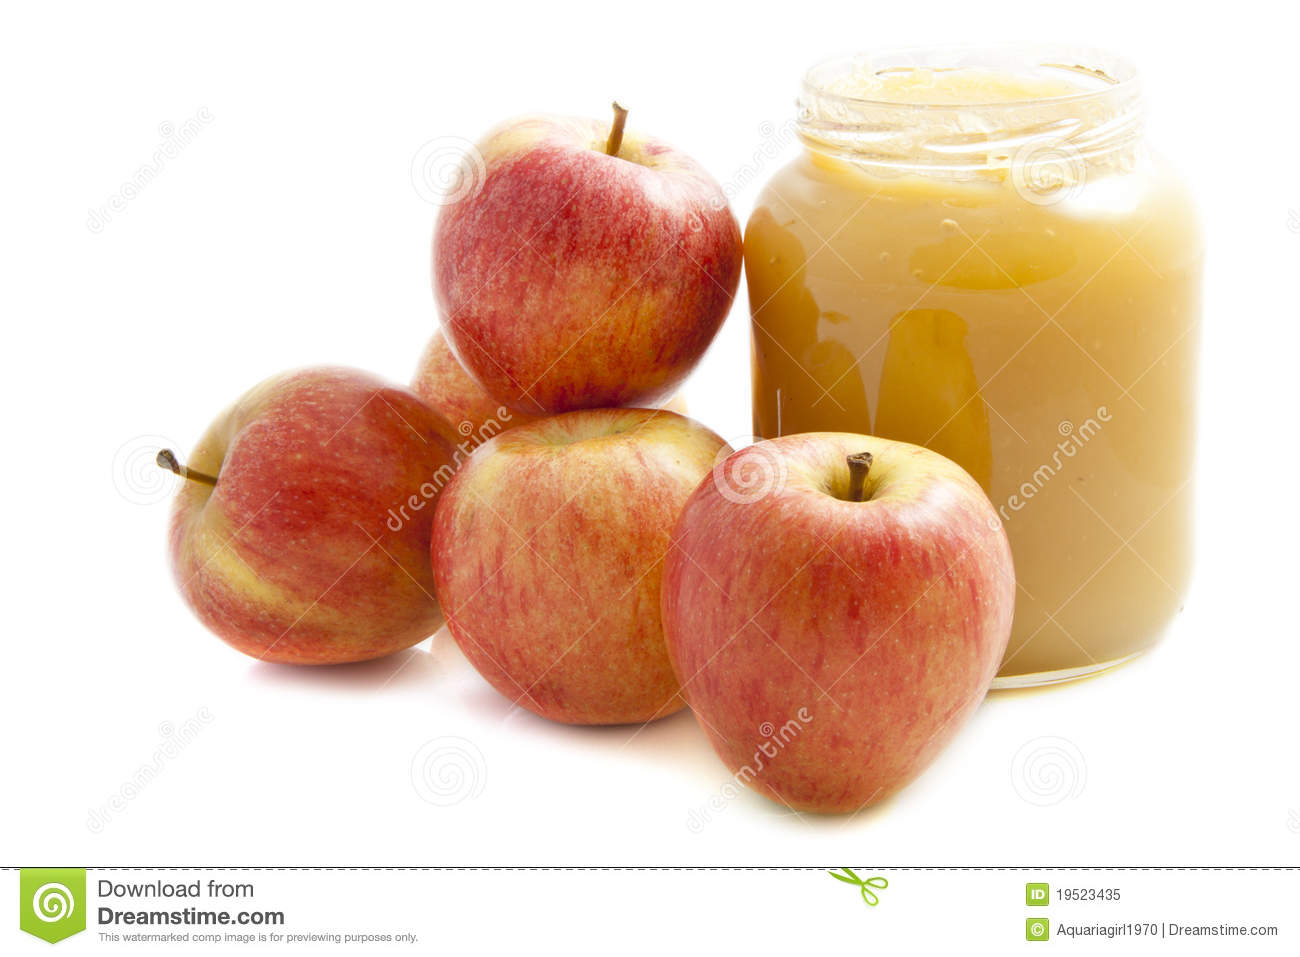 Best 62+ Applesauce Background on HipWallpaper.